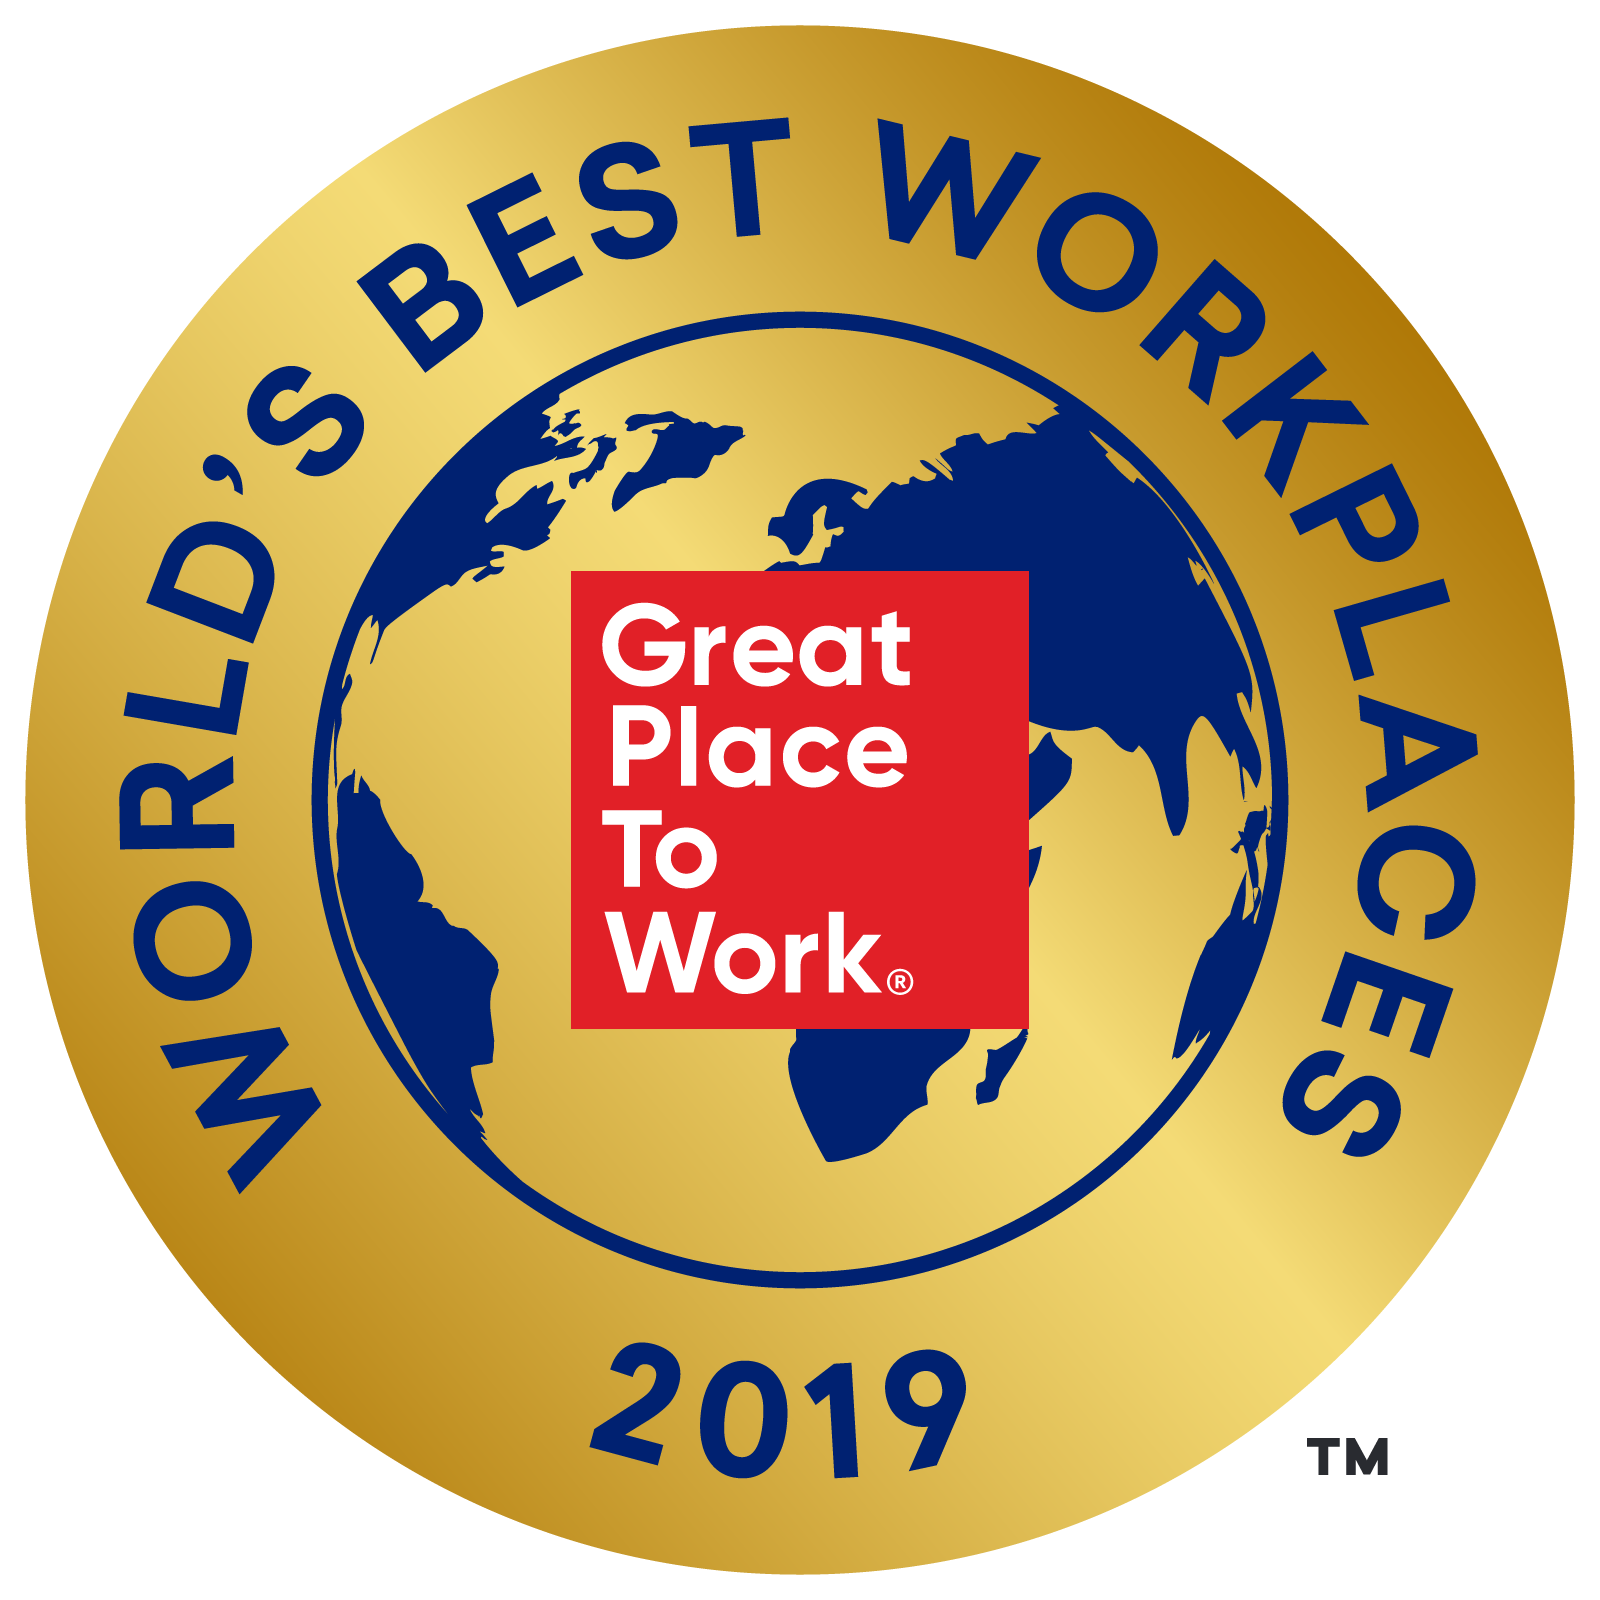 World Best Workplaces